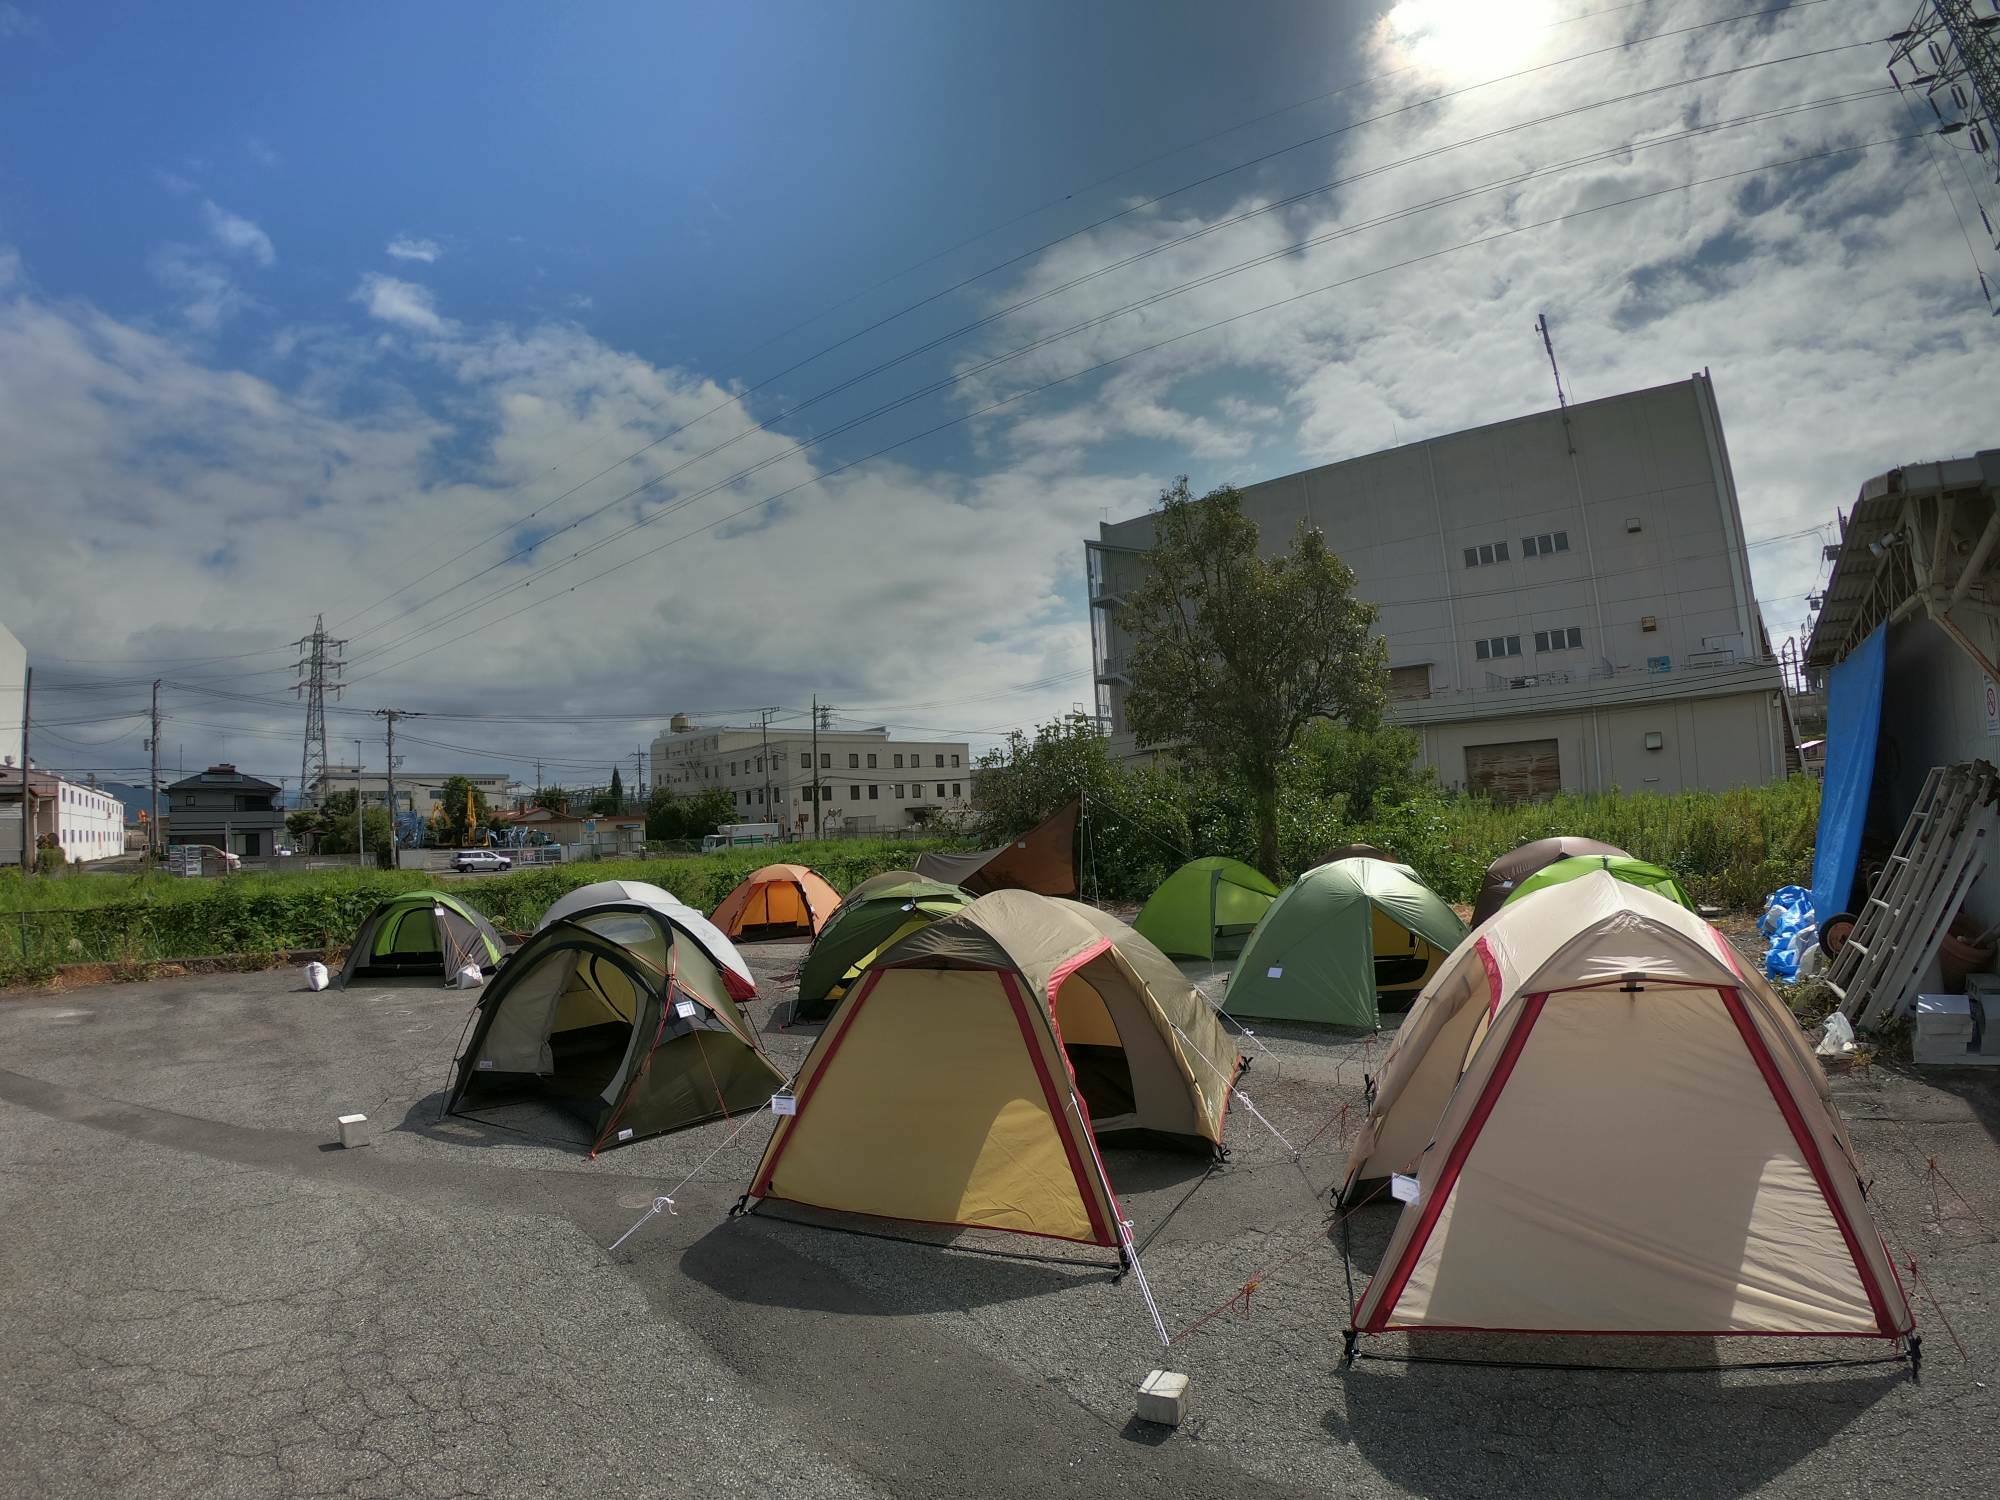 小型テント展示会開催中!